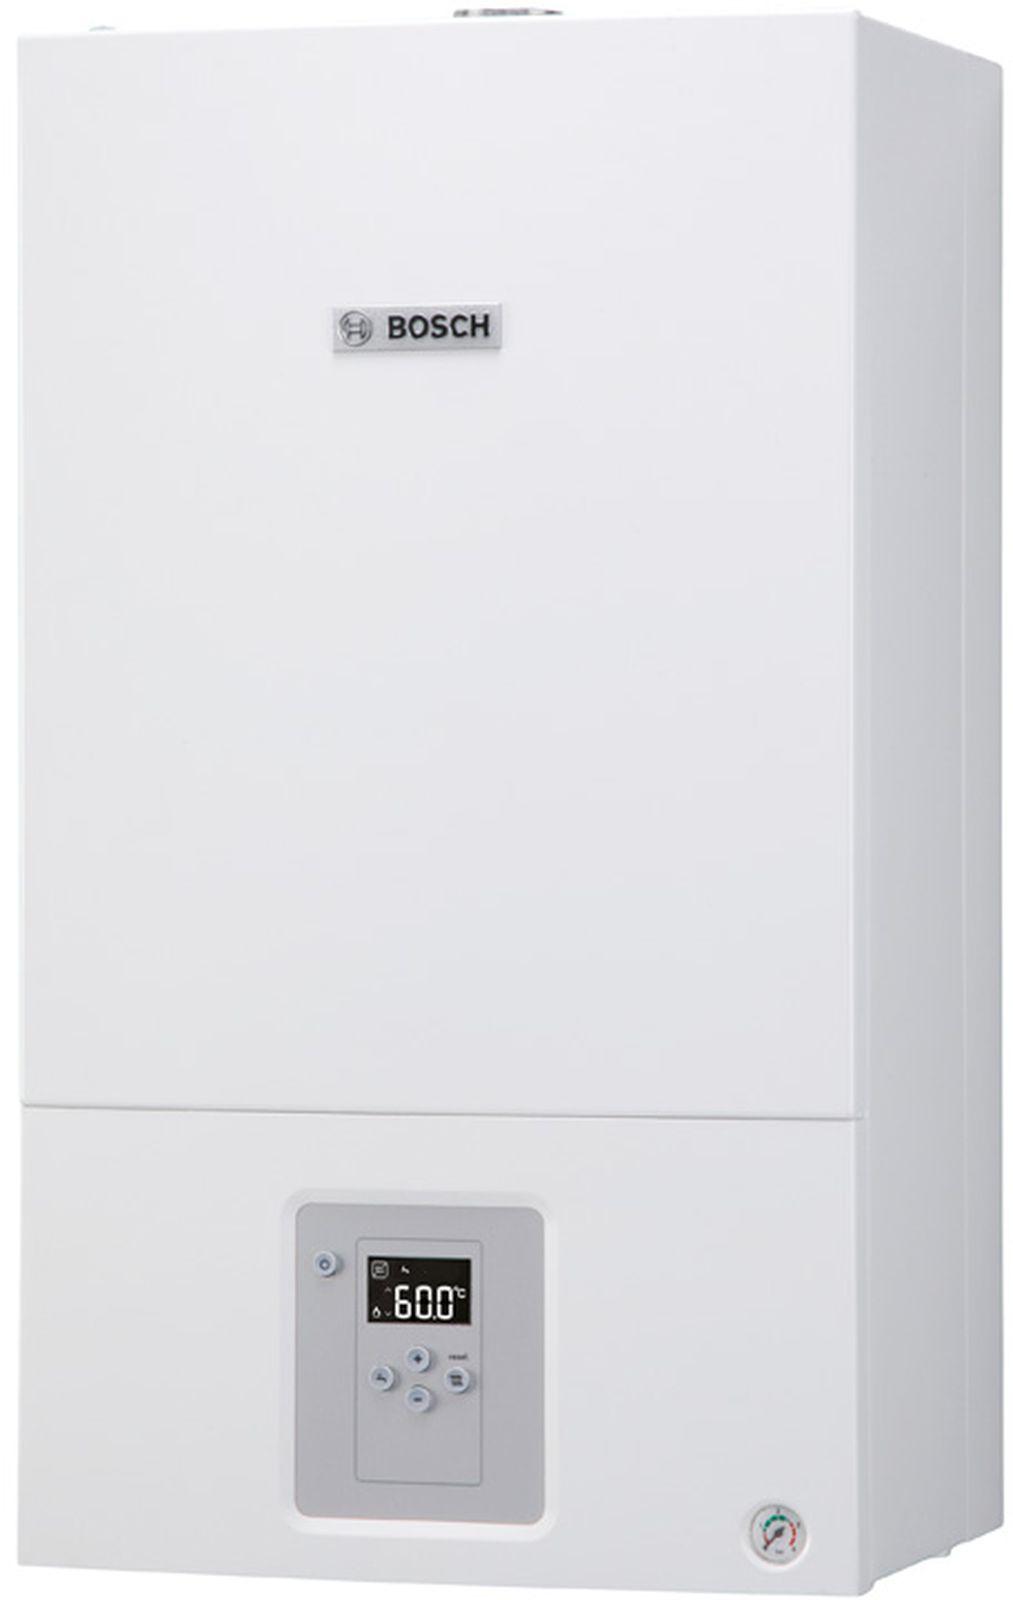 цена на Котел газовый настенный Bosch WBN6000-24H, белый